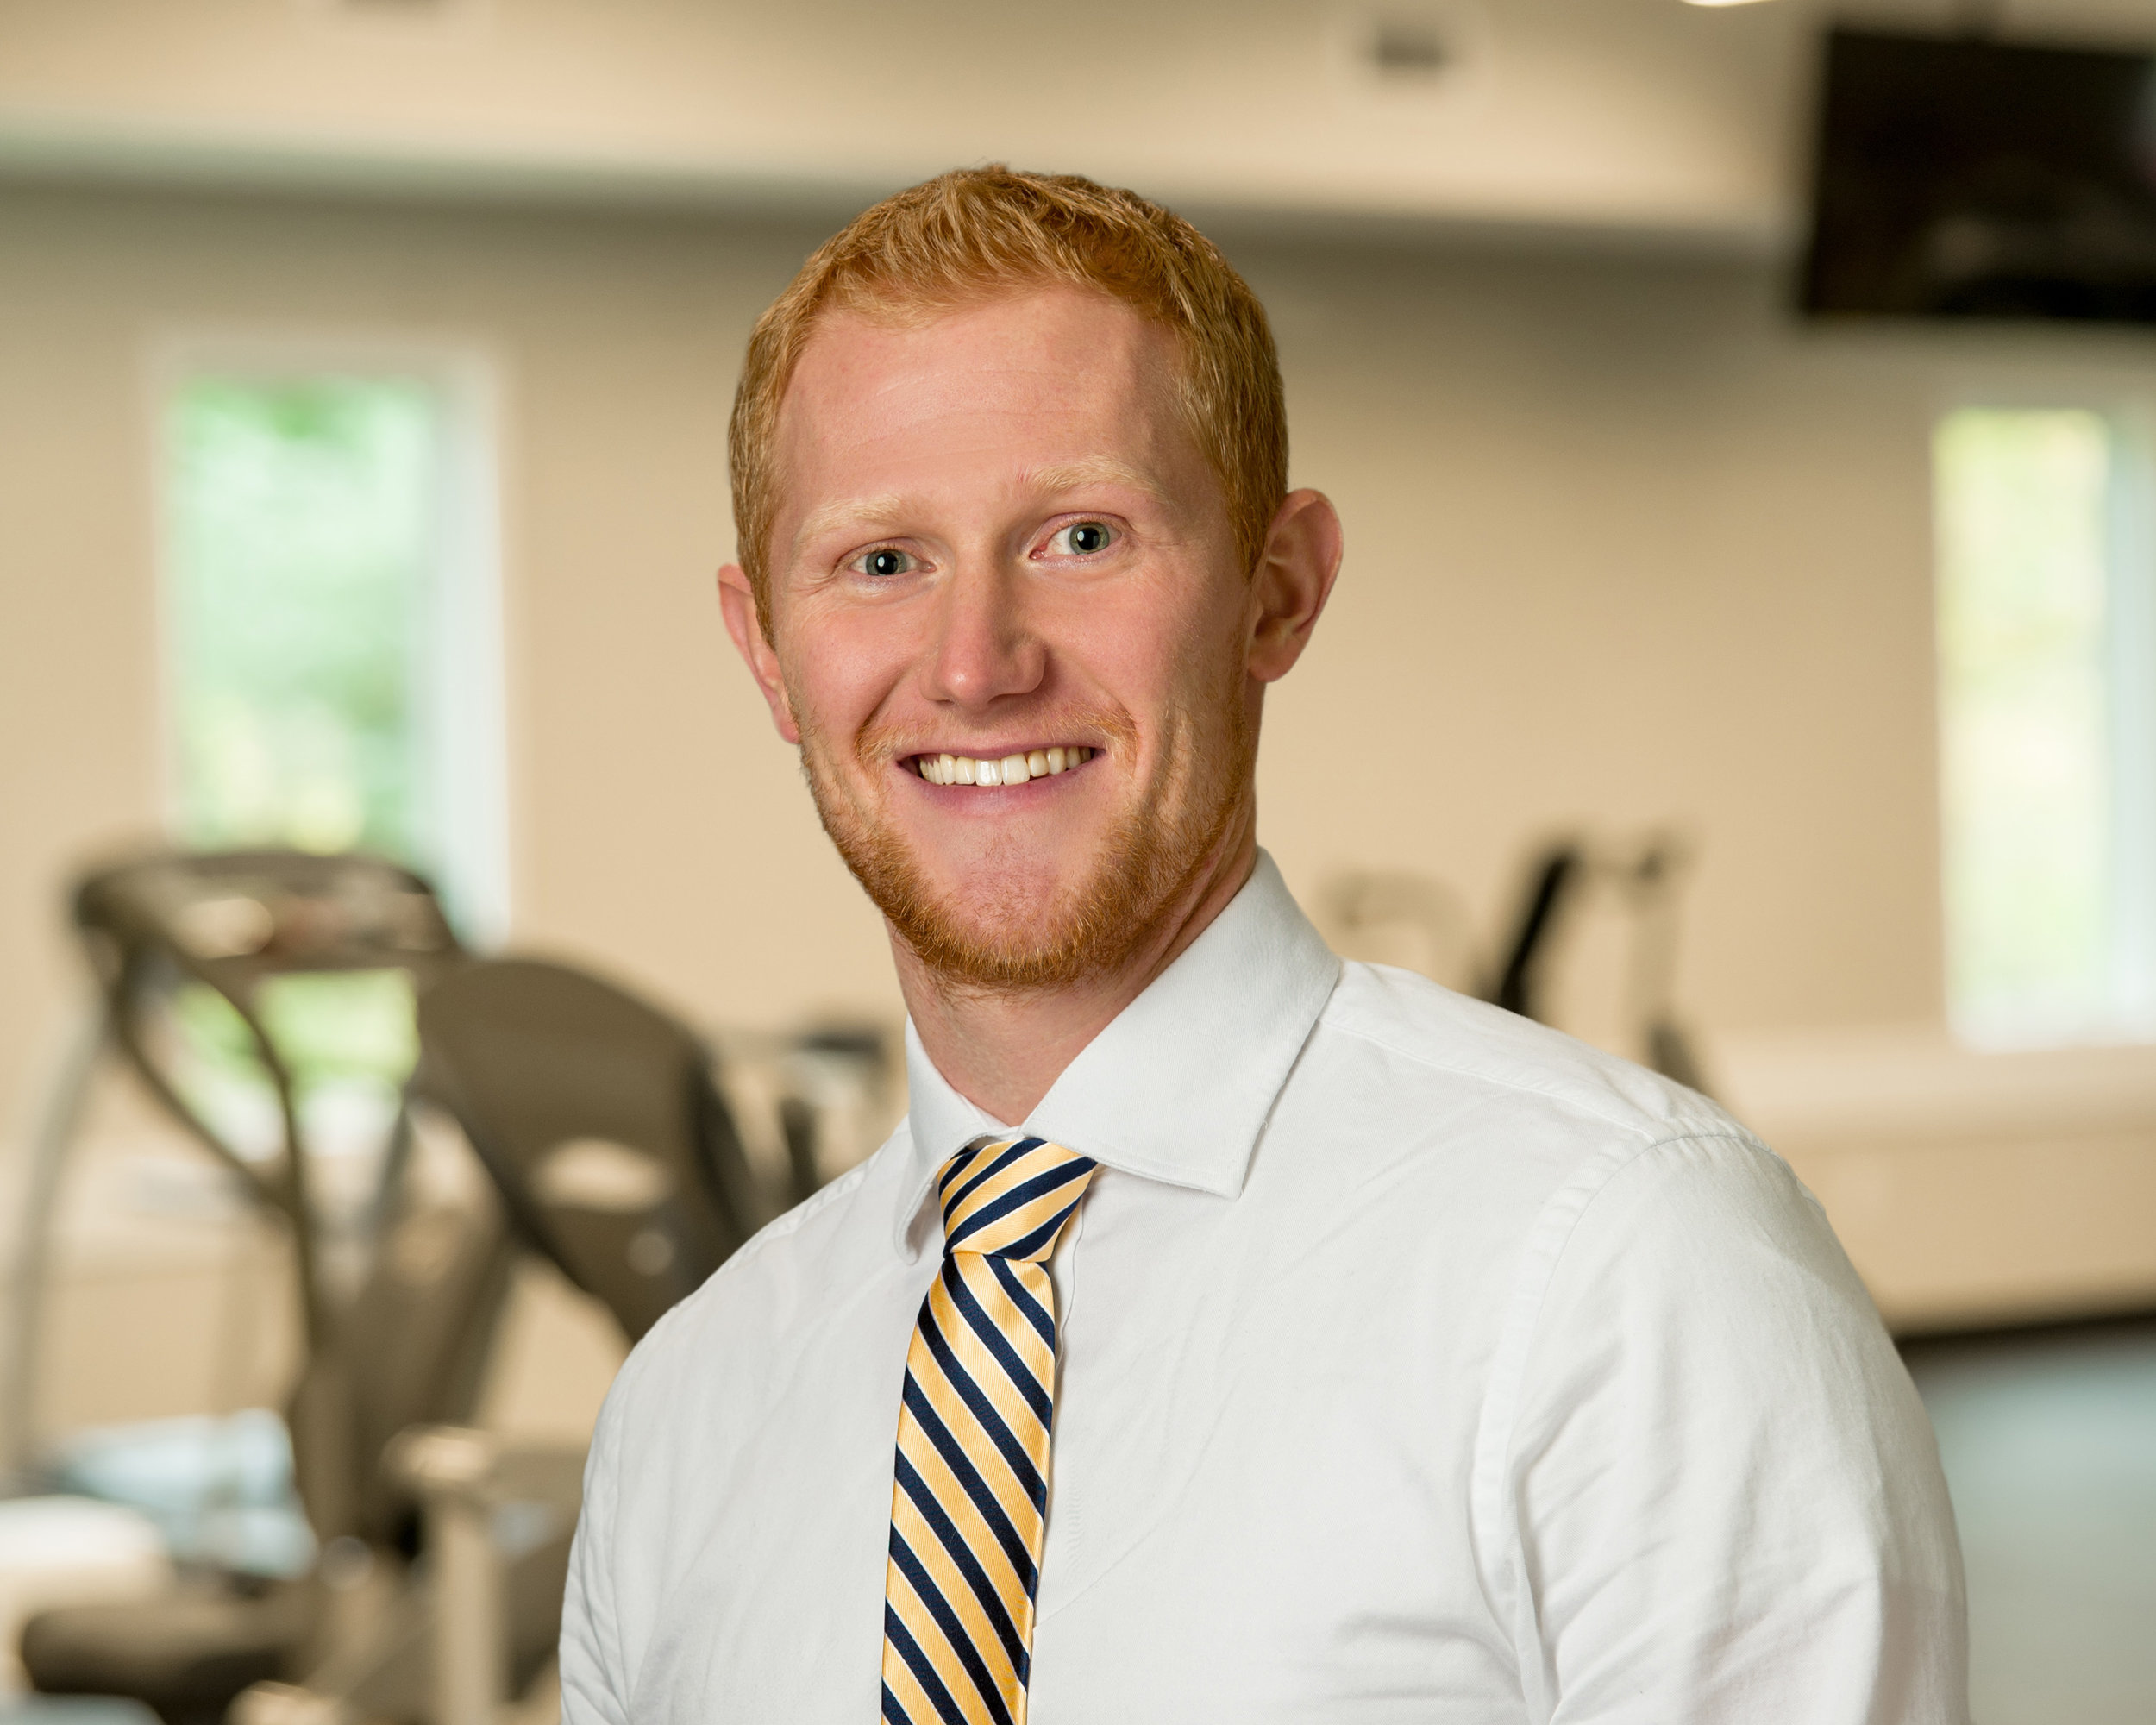 Chris devos - PT, DPT, Staff Physical Therapist